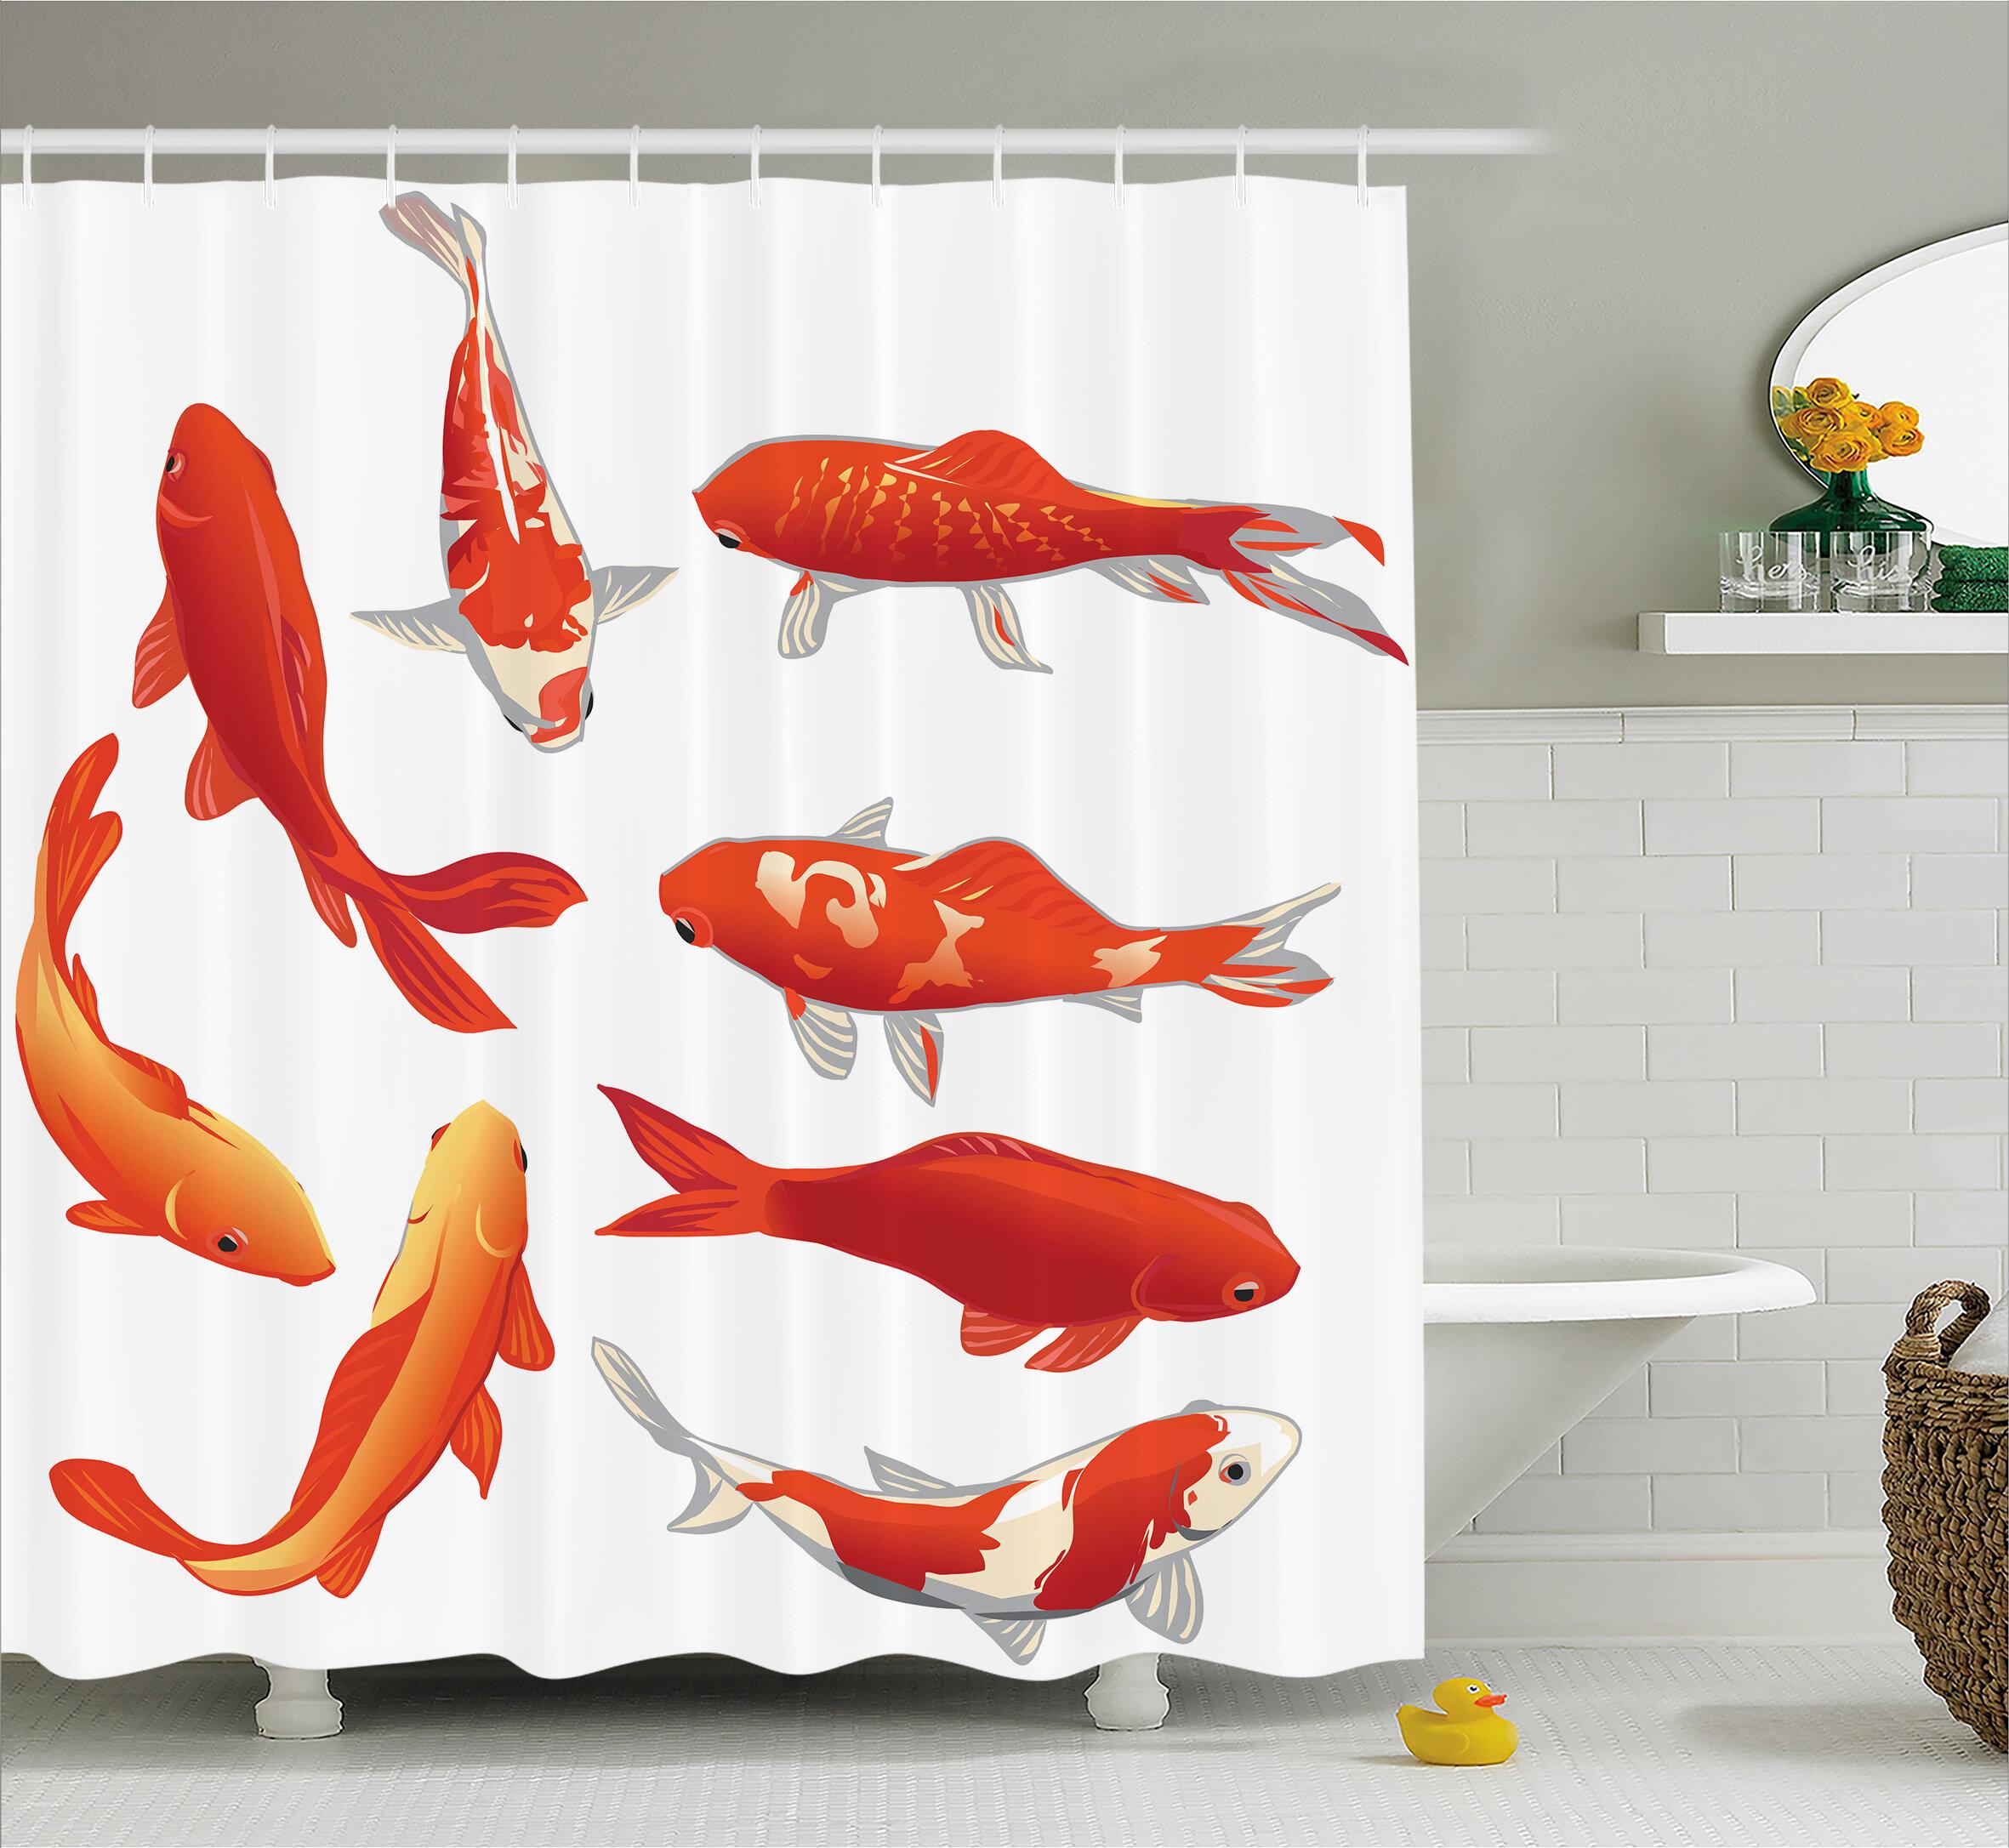 East Urban Home Koi Fish Decor Shower Curtain